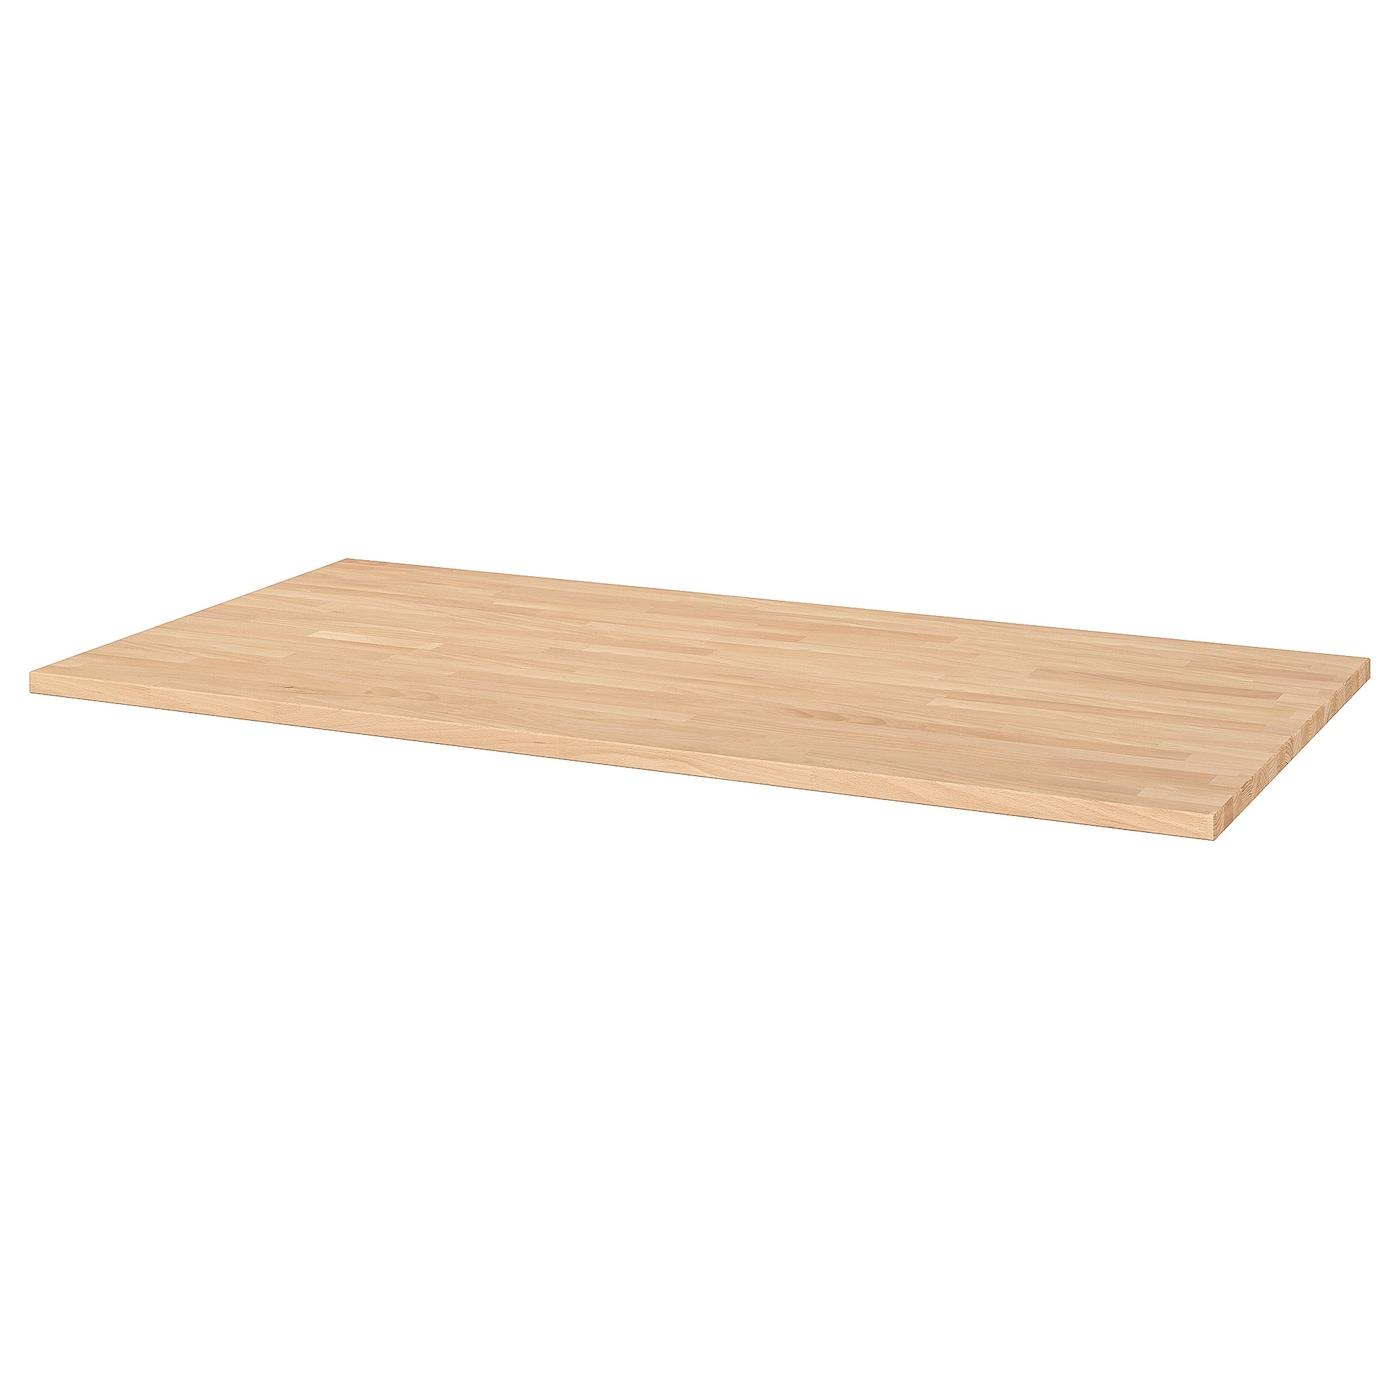 Gerton Tabletop Beech 61x29 1 2 Ikea